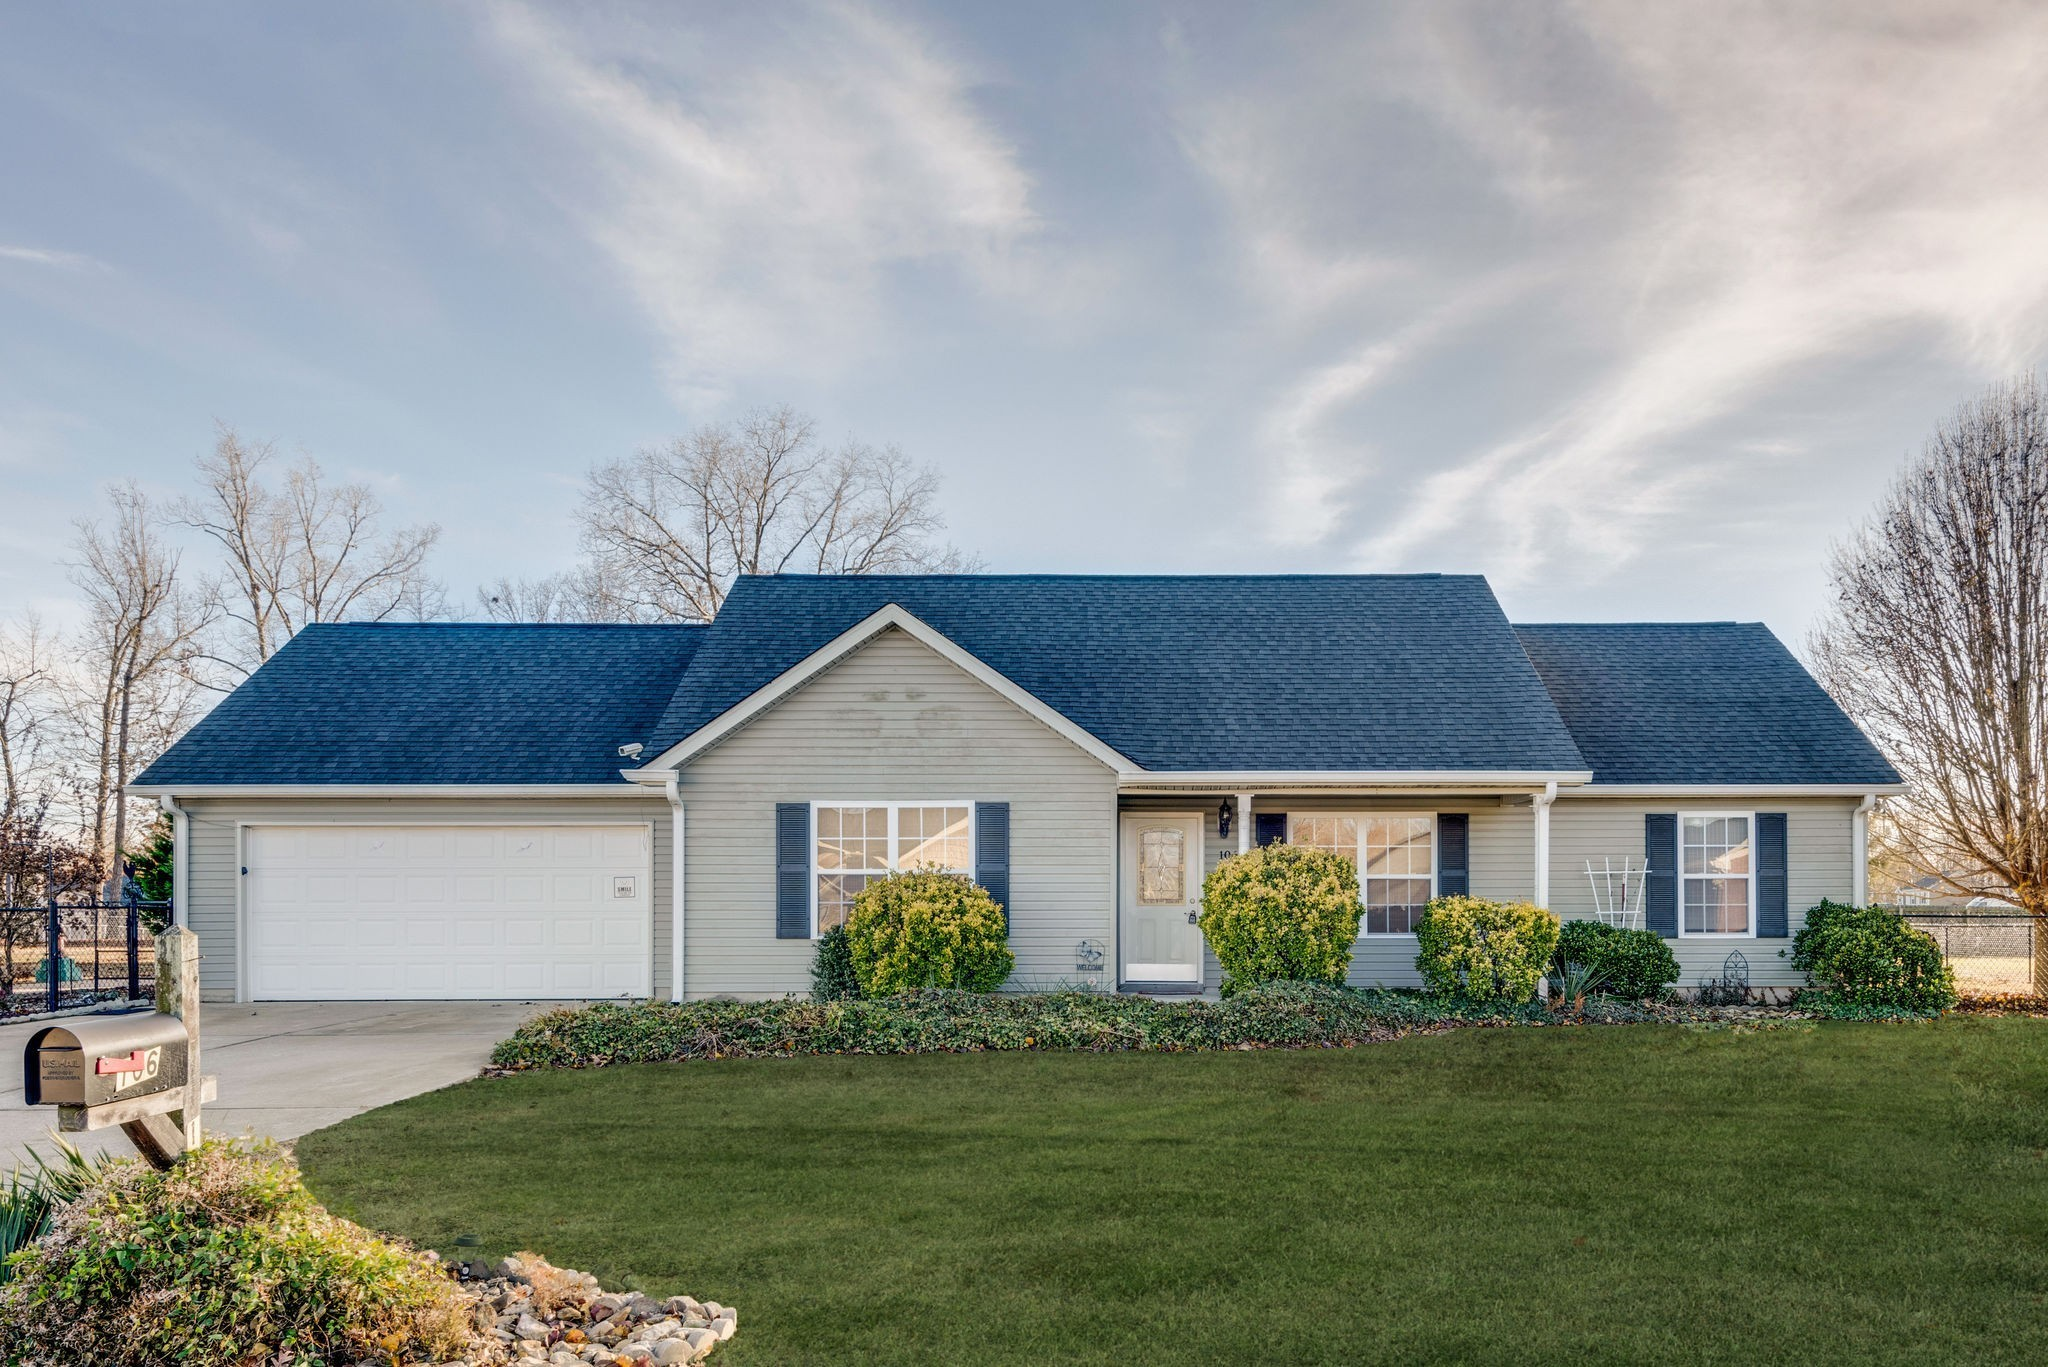 106 Marty Lane, White Bluff, TN 37187 - White Bluff, TN real estate listing